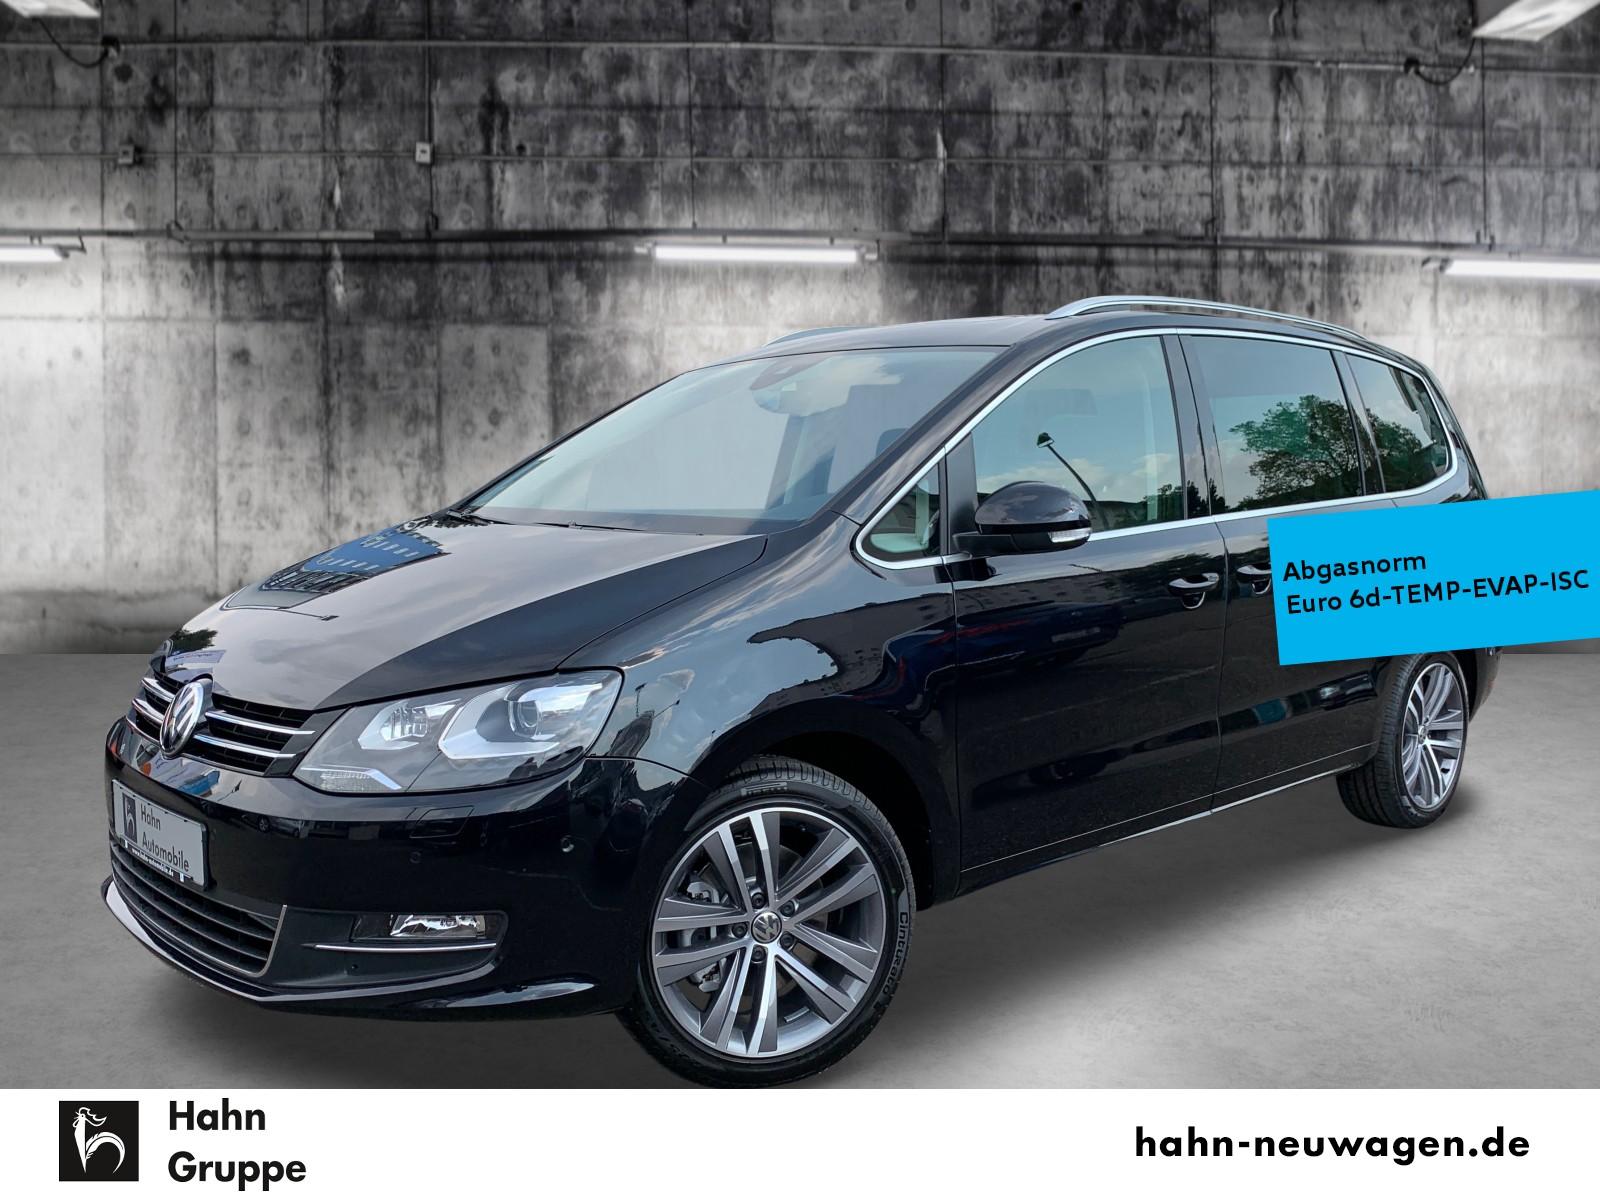 Volkswagen Sharan Highline 2,0TDI DSG 7Sitz Nav Xen Pan AHK, Jahr 2021, Diesel